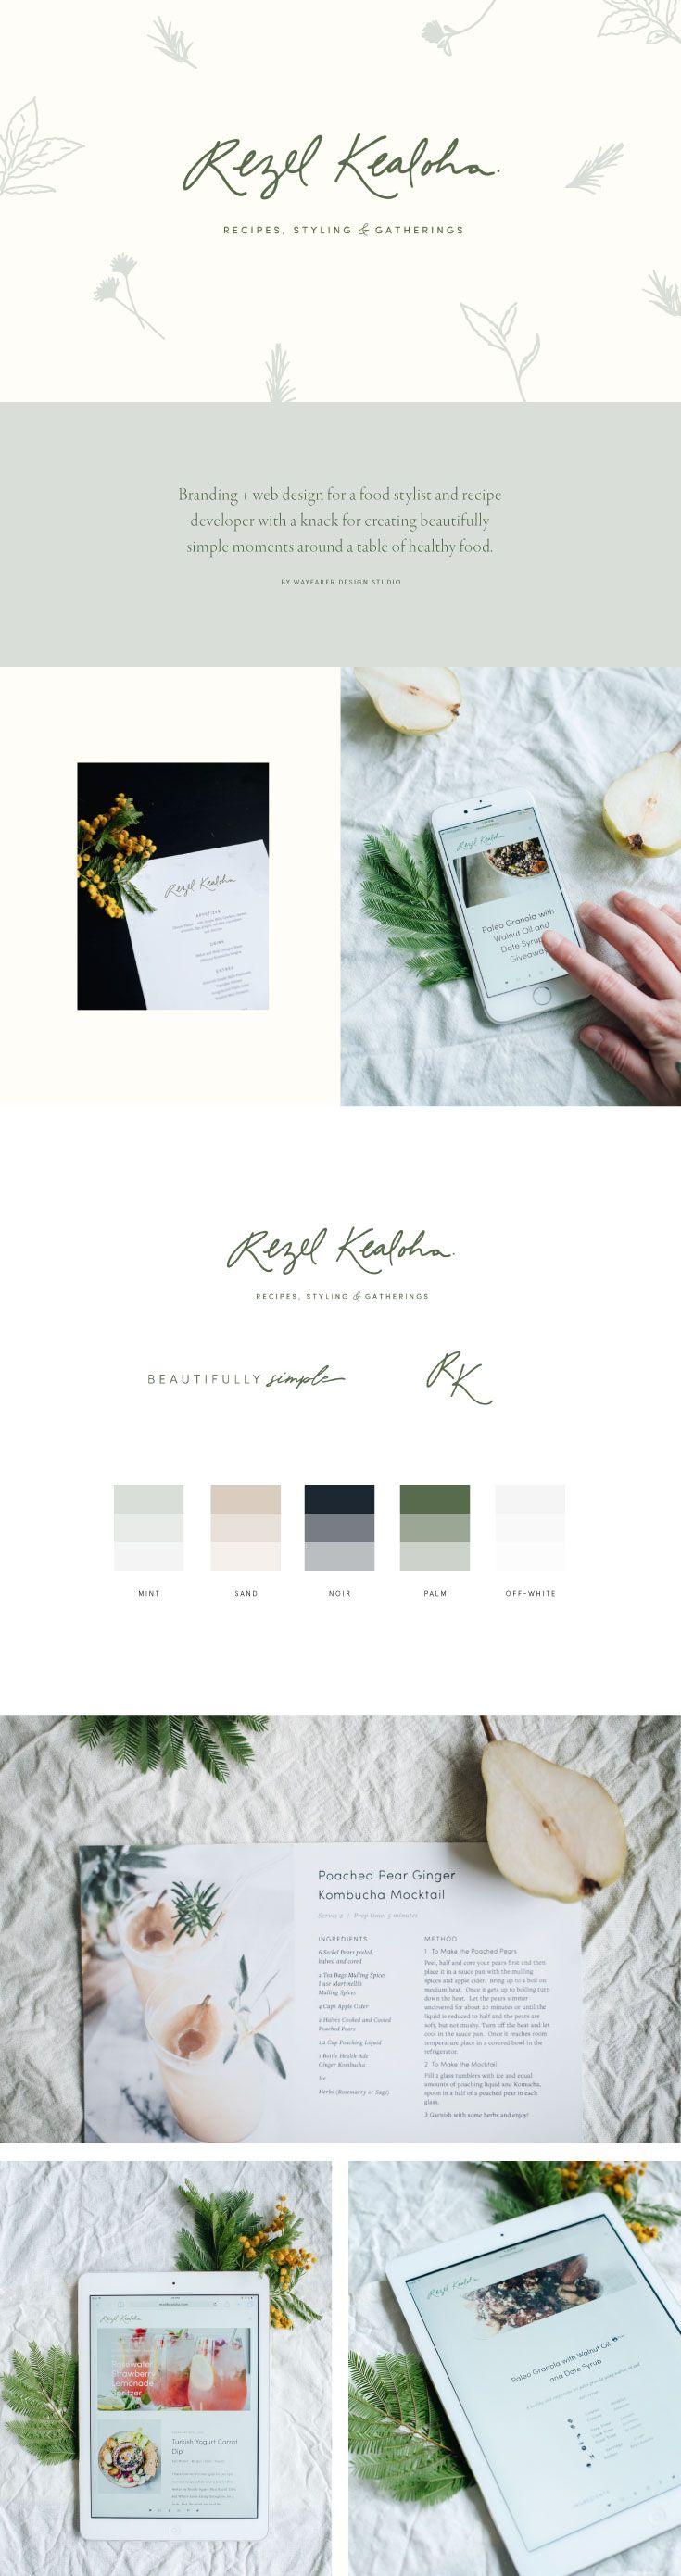 Branding + website design for Rezel Kealoha by Wayfarer Design Studio // design, branding, brand, brand identity, logo, logos, graphic design, identity, web, website, website design, blogger, food blogger, blog design, recipe, lettering, hand lettering, food, blogging